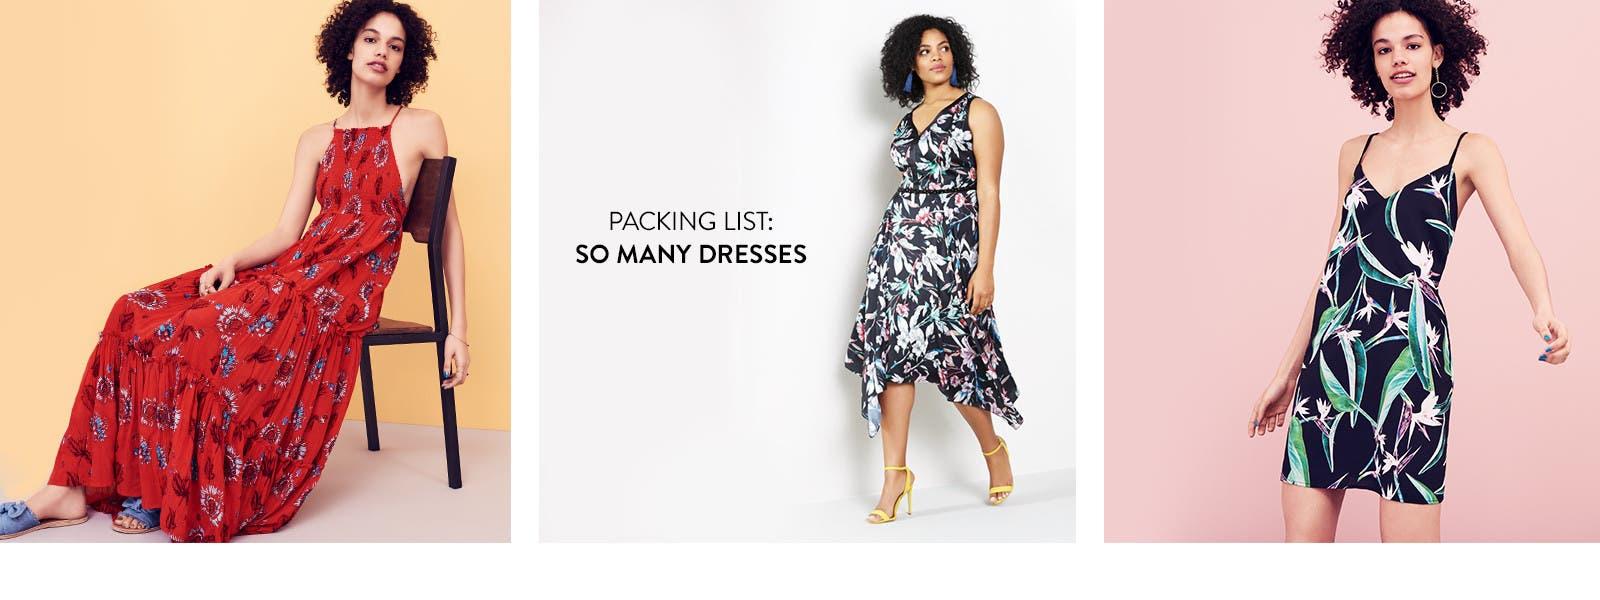 womens dresses shop wedding dresses nordstrom Packing list so many dresses